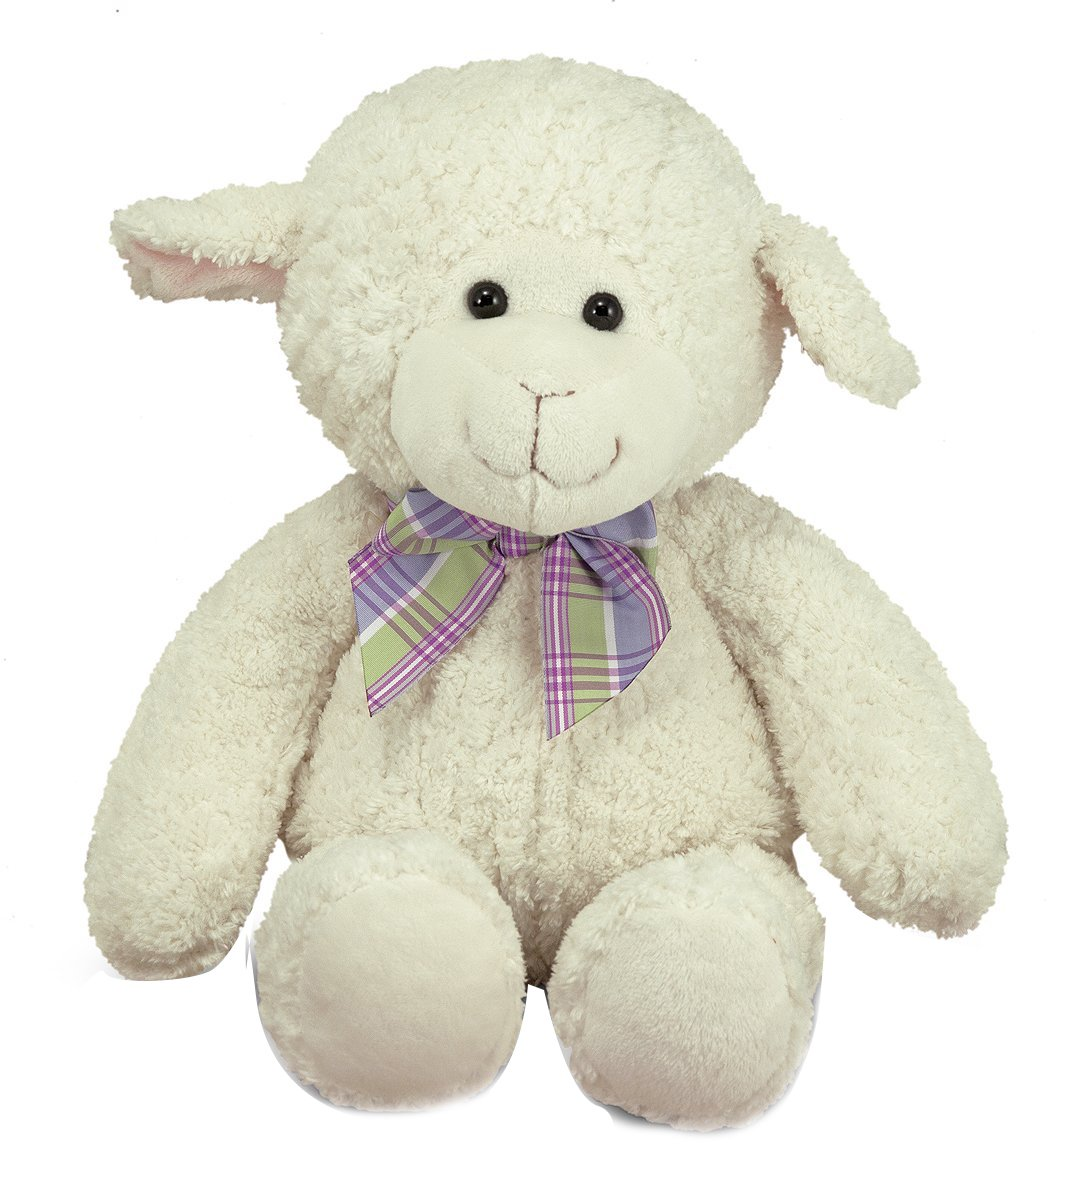 Melissa & Doug Lovey Lamb Stuffed Animal (10 inches)